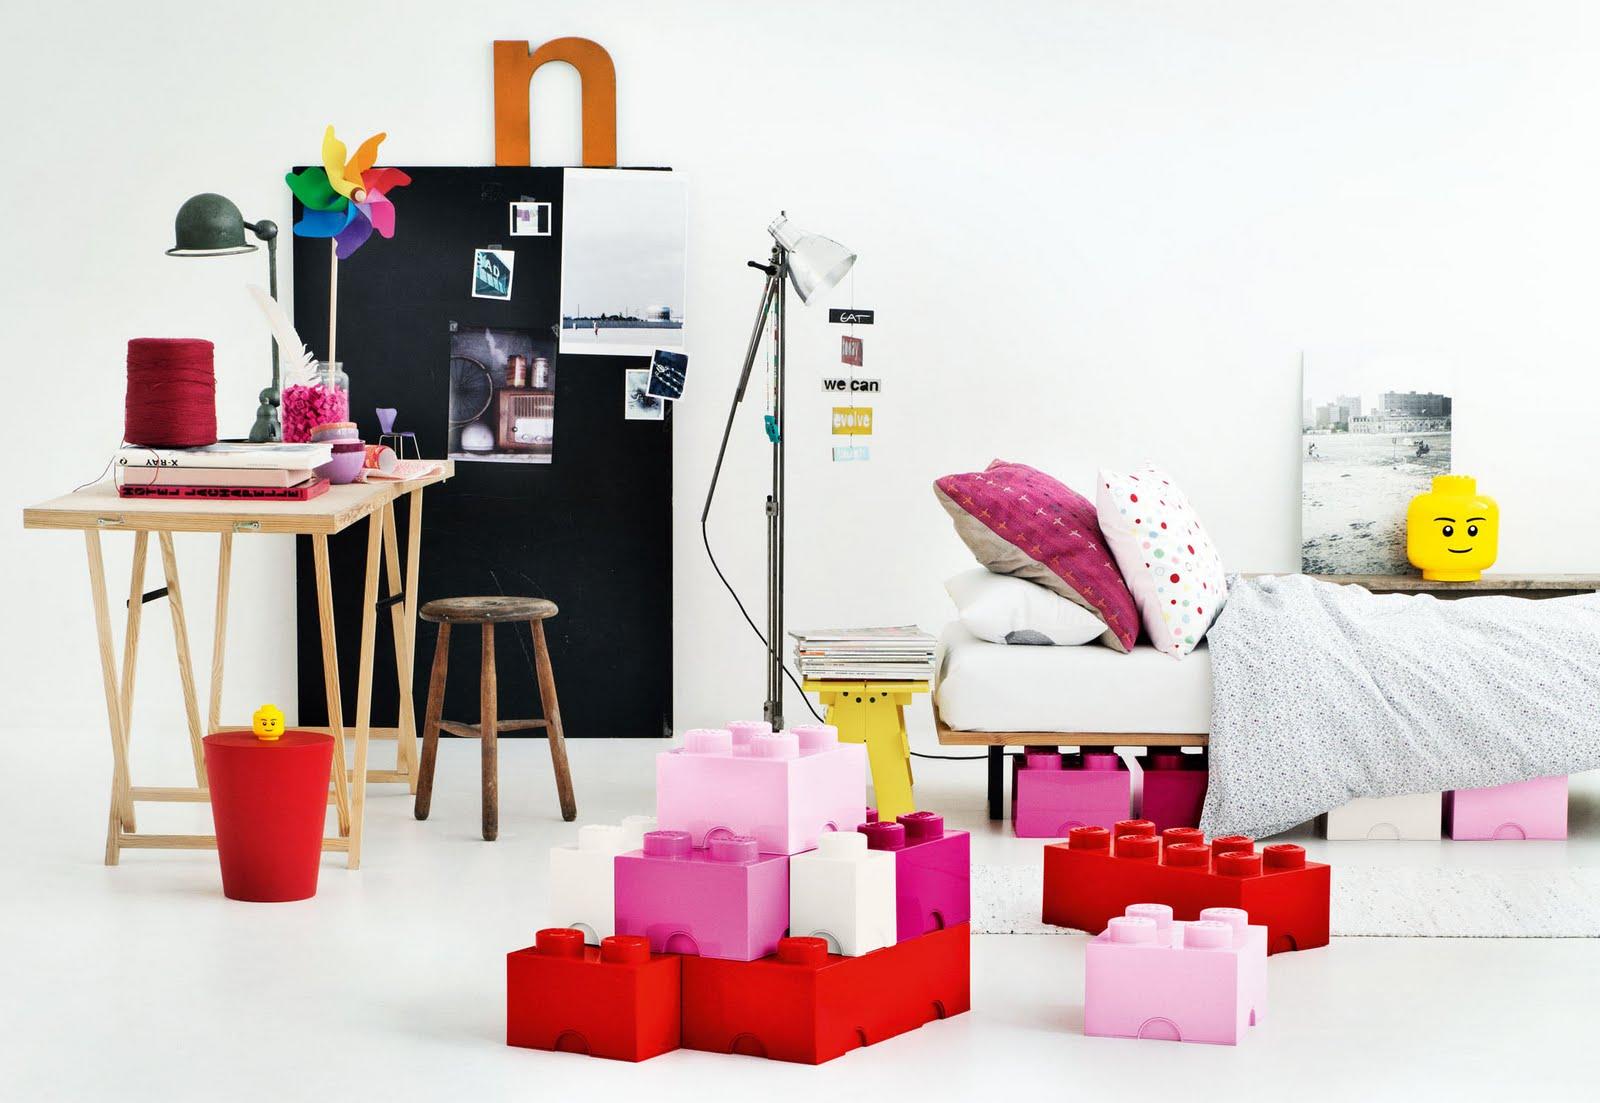 http://2.bp.blogspot.com/_Tn-imEmwXt8/TBZaAPMZQqI/AAAAAAAAA4o/aSkypOTgFVY/s1600/la-chica-del-solitario-lego-storage-boxes%5B1%5D.jpg